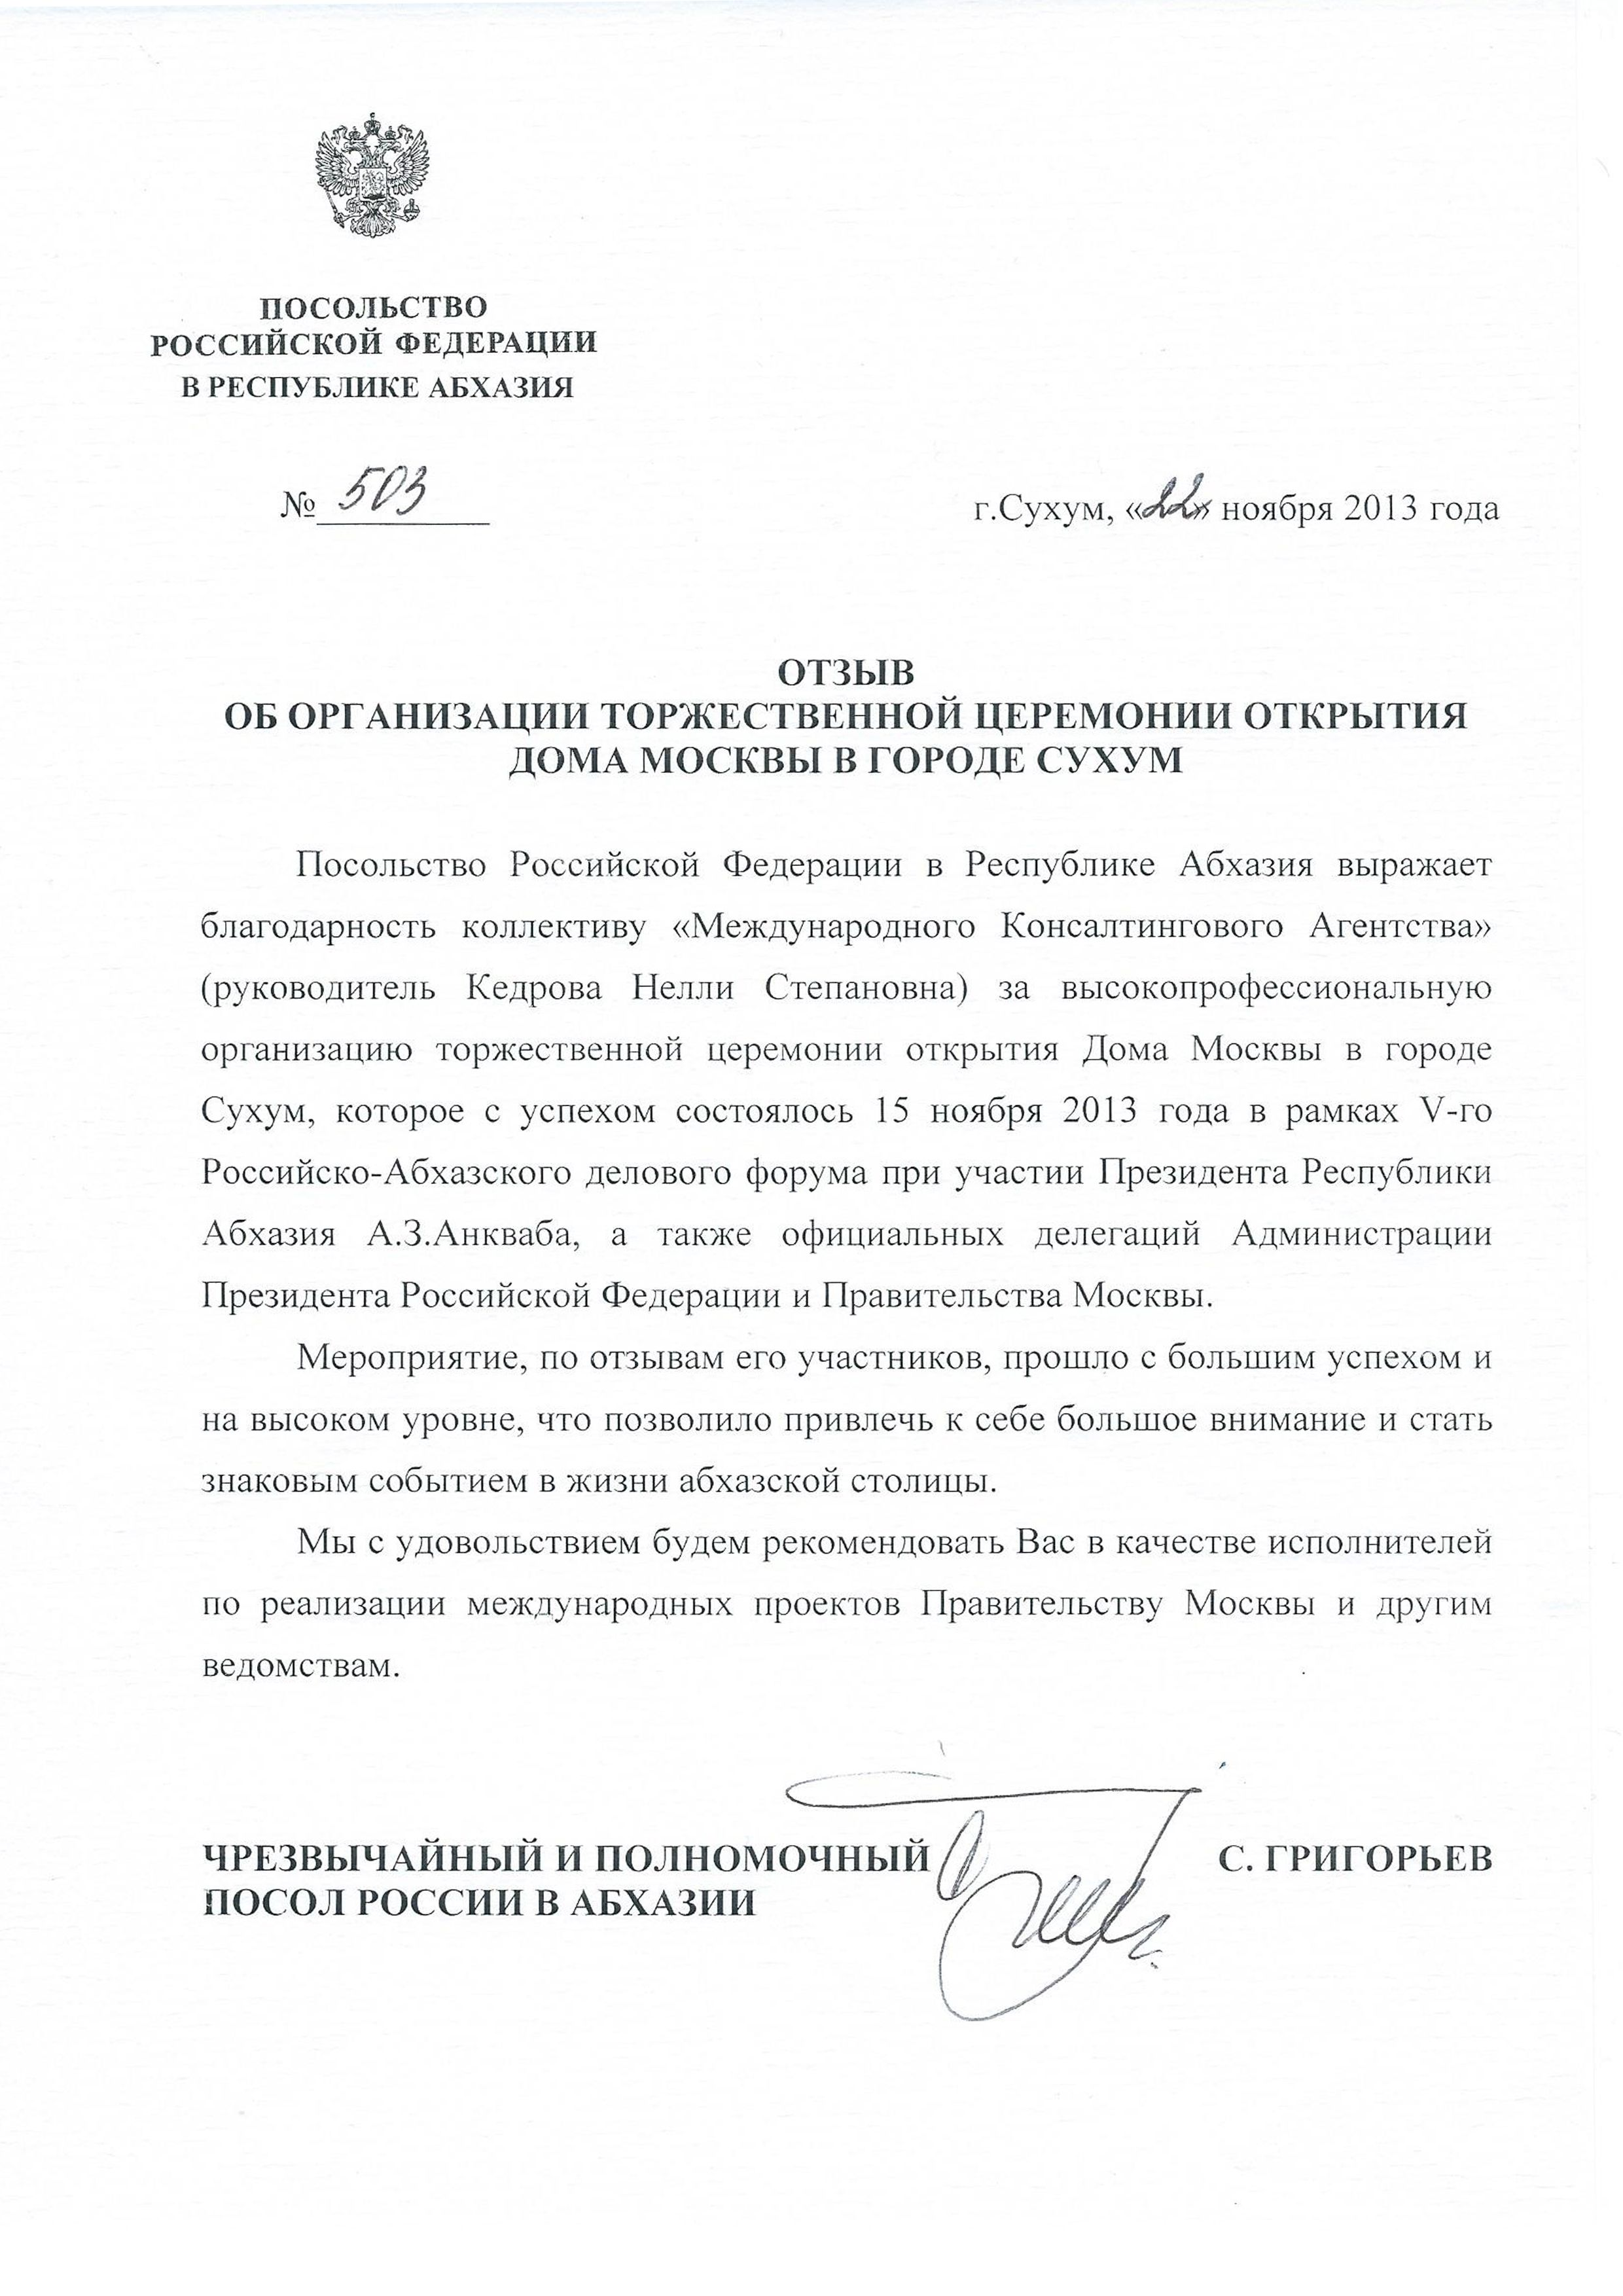 b_0_0_0_00_images_response_Отзыв_Посла_РФ_в_Абхазии.jpg